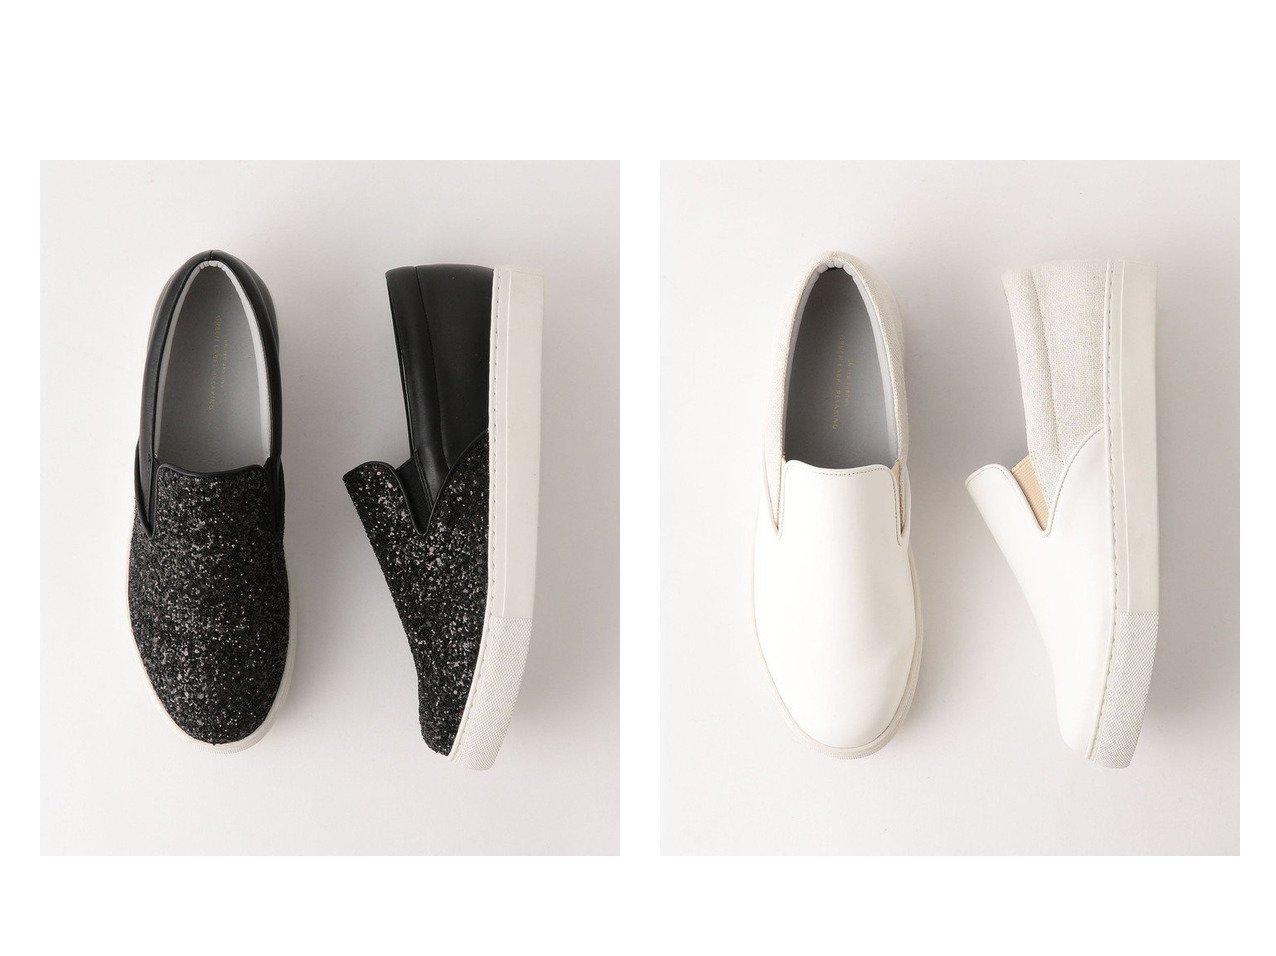 【green label relaxing / UNITED ARROWS/グリーンレーベル リラクシング / ユナイテッドアローズ】のSC スリッポン スニーカー シューズ・靴のおすすめ!人気、トレンド・レディースファッションの通販 おすすめで人気の流行・トレンド、ファッションの通販商品 メンズファッション・キッズファッション・インテリア・家具・レディースファッション・服の通販 founy(ファニー) https://founy.com/ ファッション Fashion レディースファッション WOMEN カットソー グリッター シャツワンピ シューズ シンプル スニーカー スリッポン トレンド 定番 Standard 人気 パイソン ビッグ おすすめ Recommend  ID:crp329100000023323